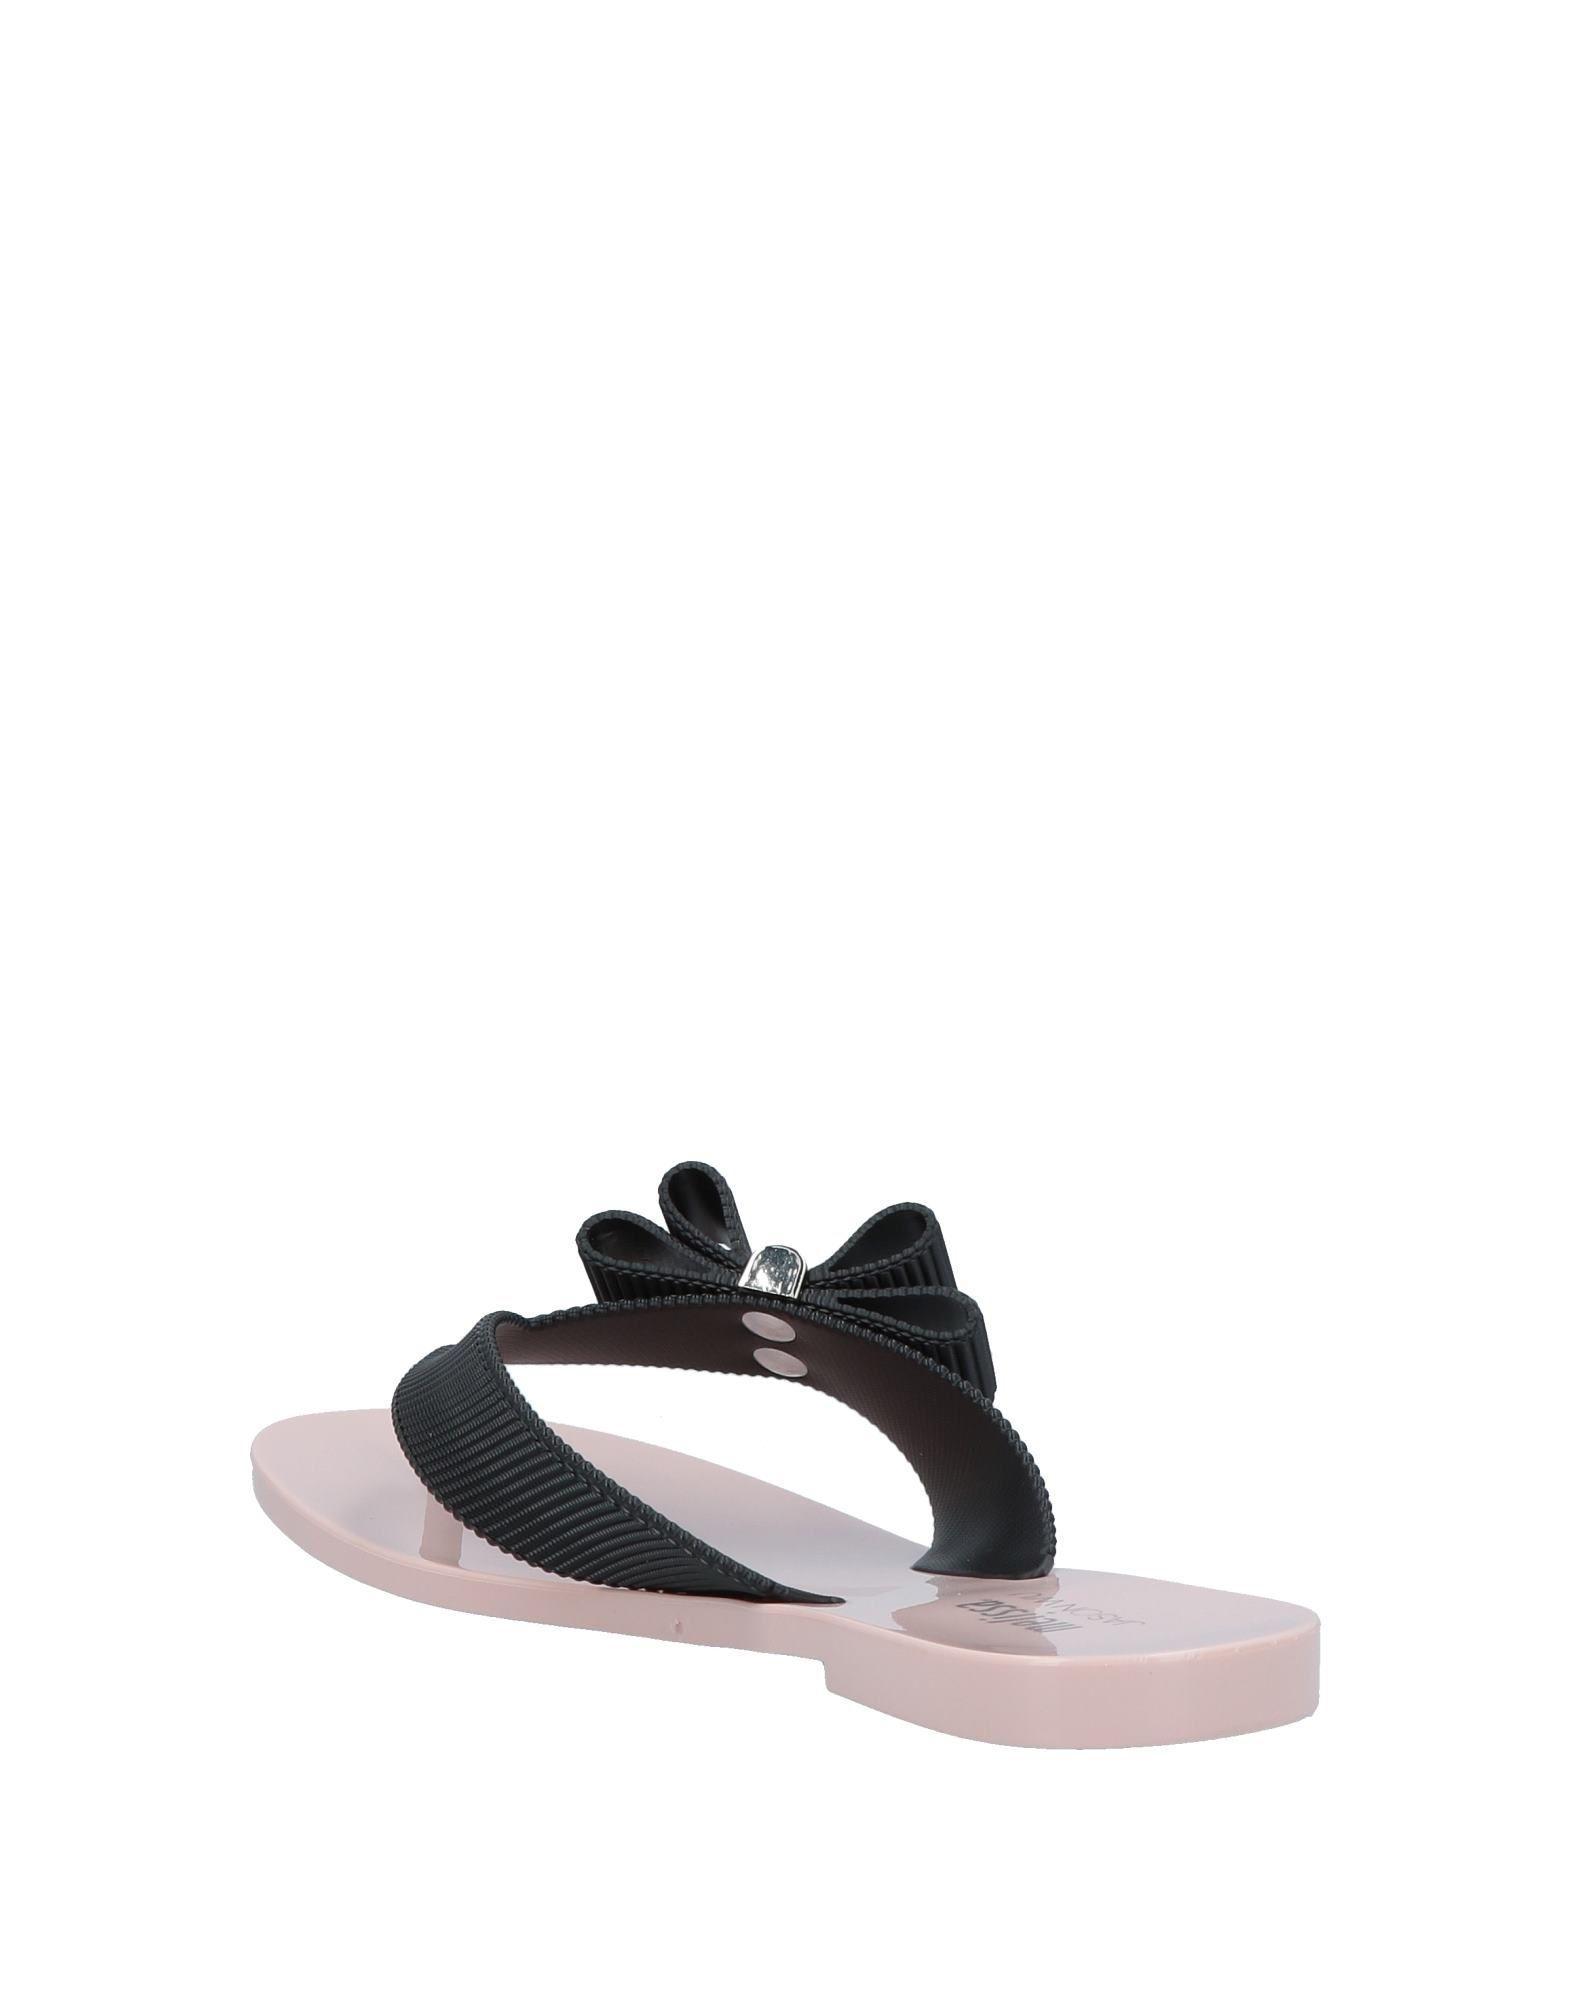 52853f96f04a4 Lyst - Melissa Toe Strap Sandal in Black